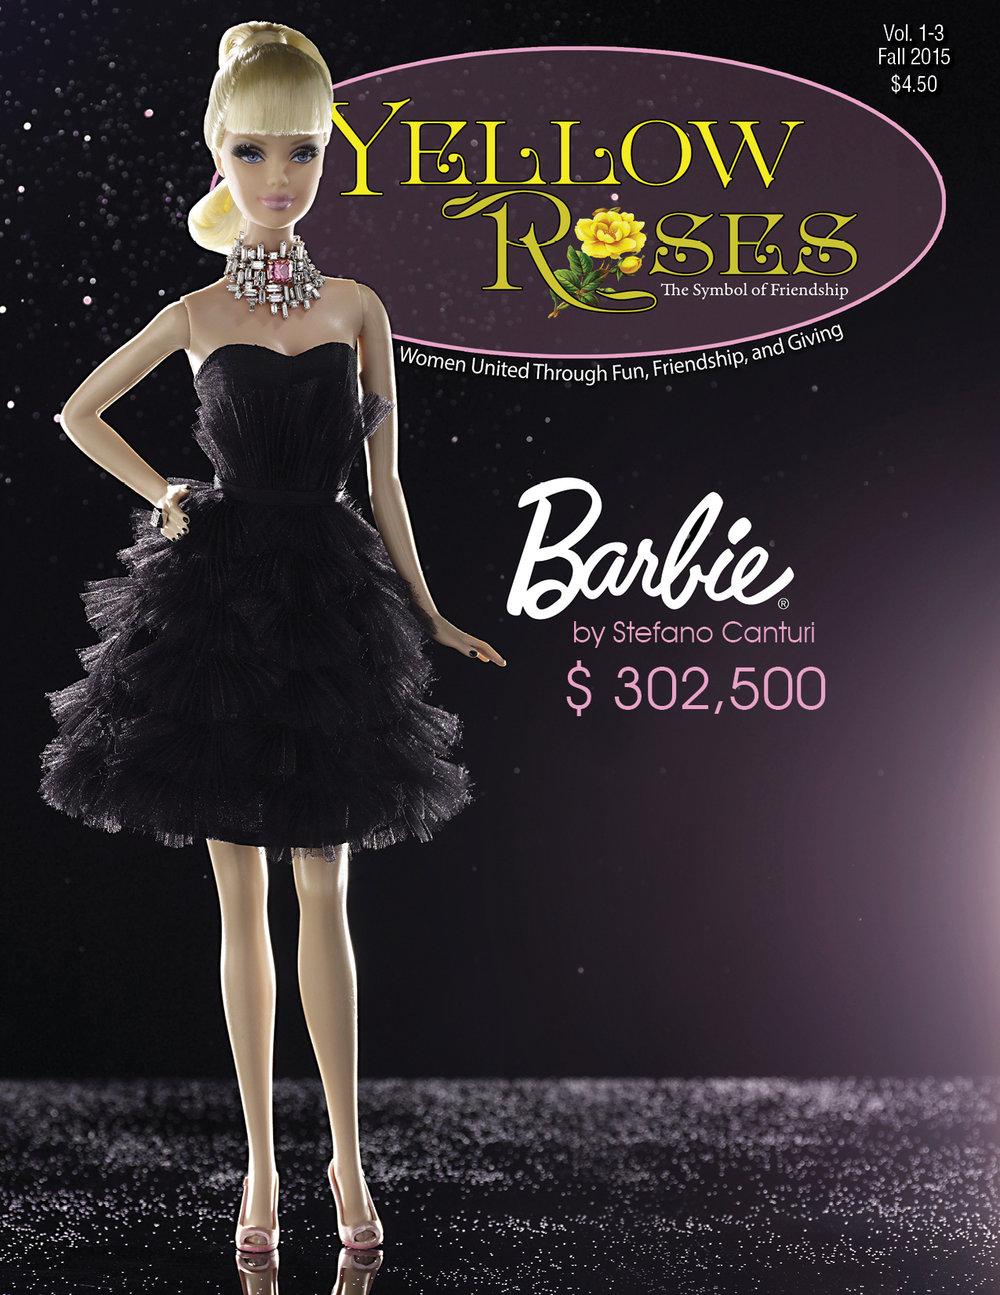 barbiecover.jpg